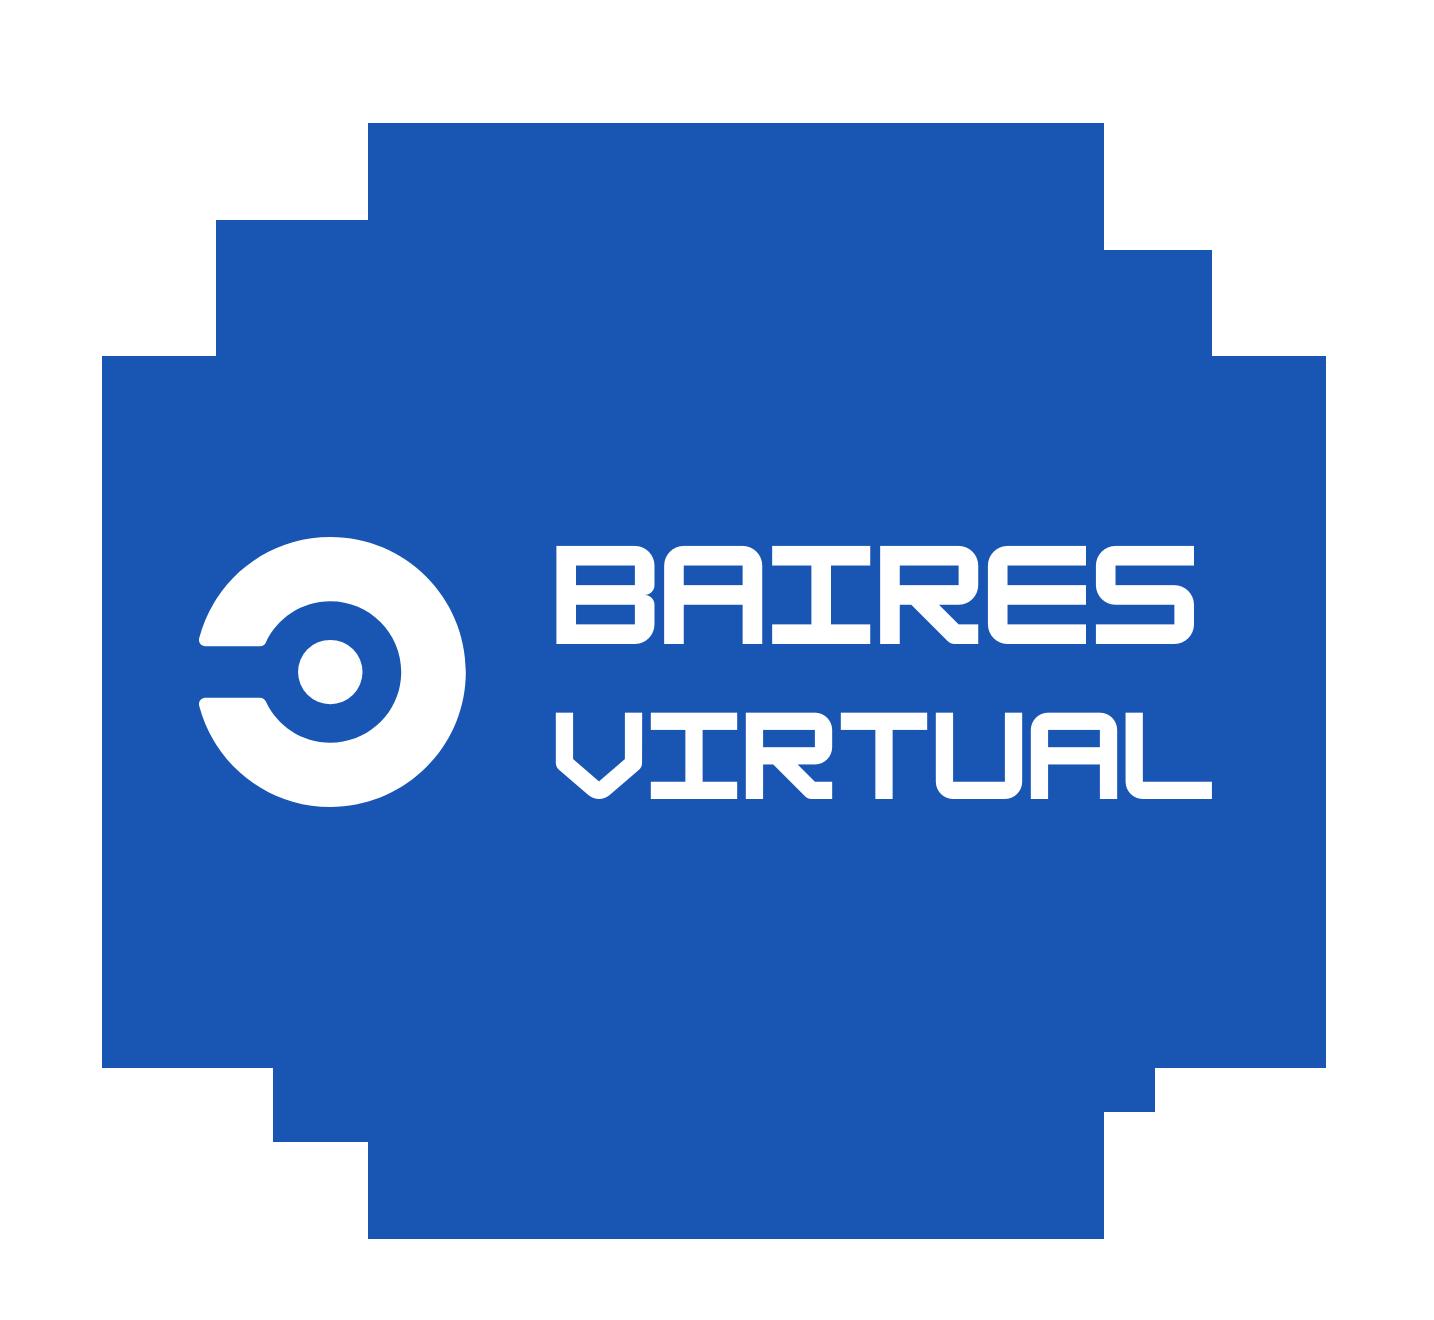 bairesvirtual